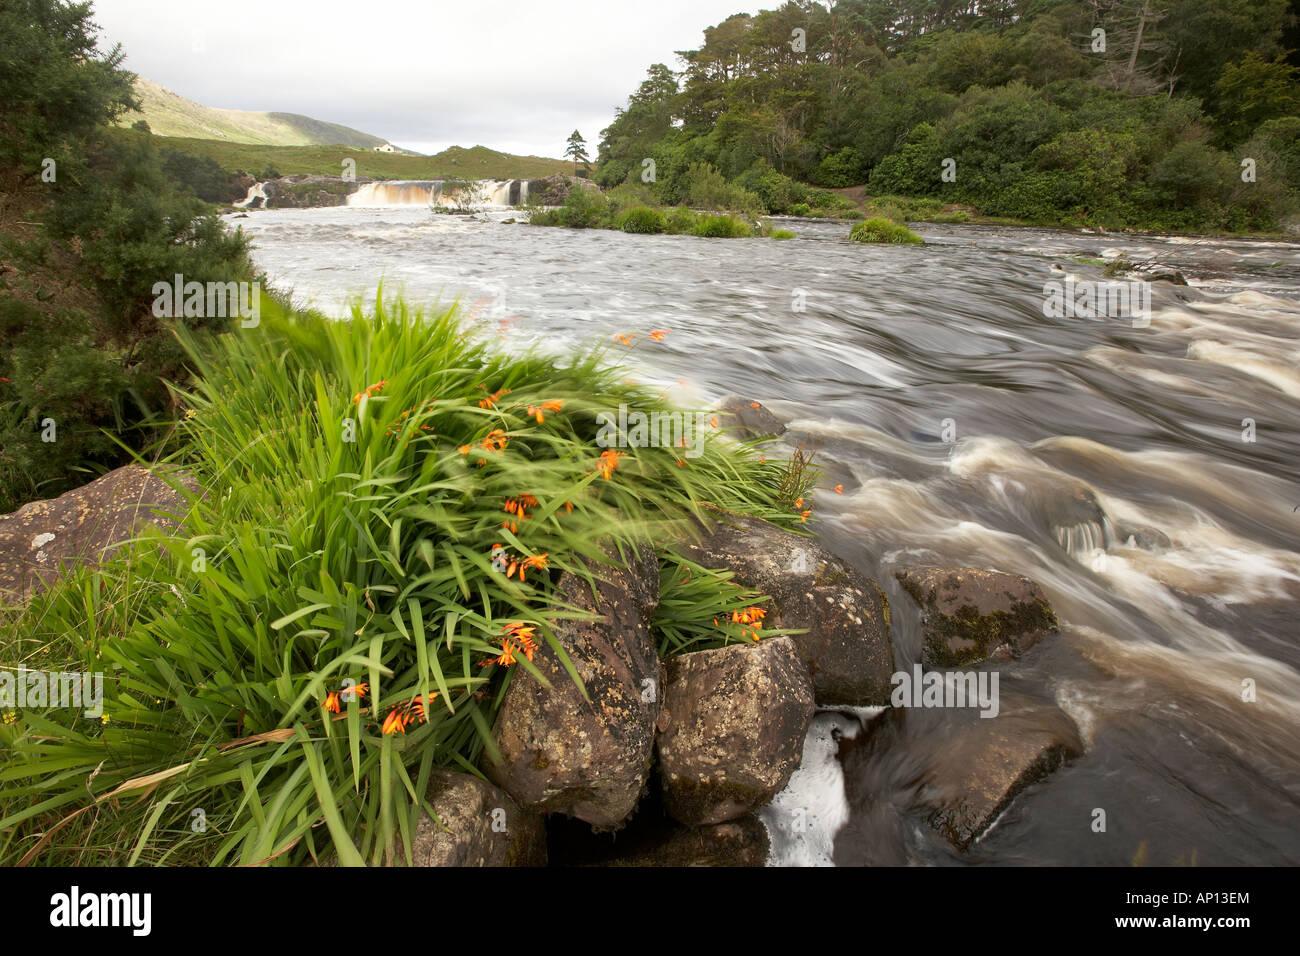 Aasleagh falls on the Erriff River near Leenane Leenaun Connemara County Mayo Republic of Ireland - Stock Image